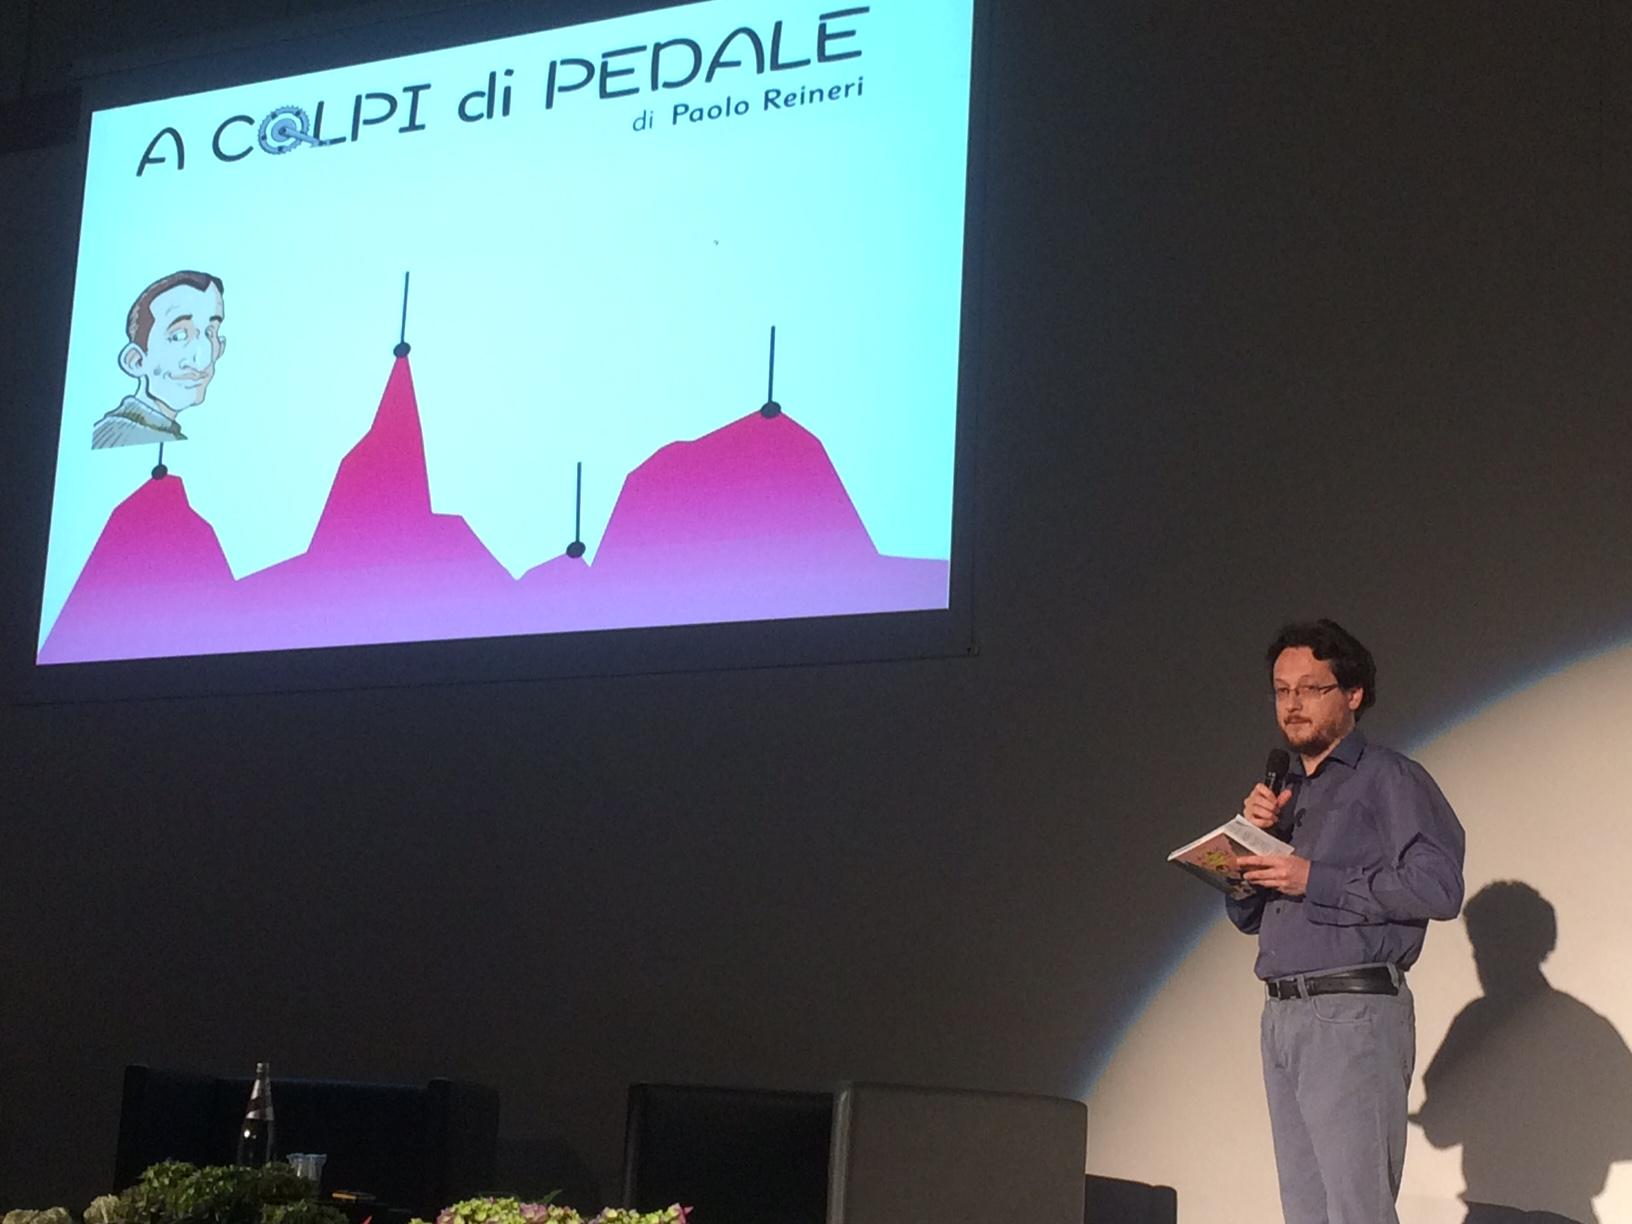 Paolo Reineri introduce la serata